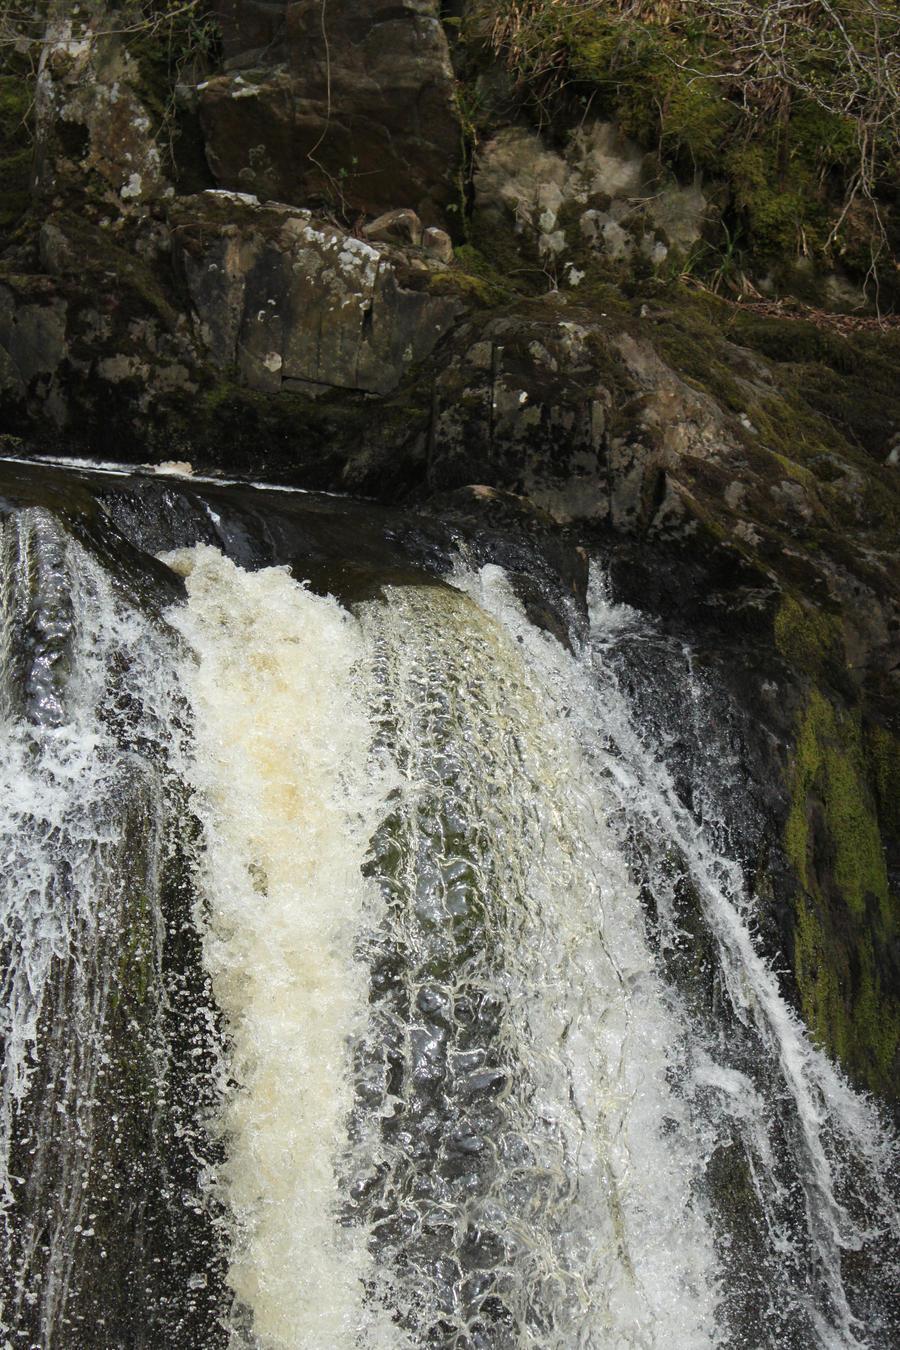 Ingleton Falls 44 by Tasastock